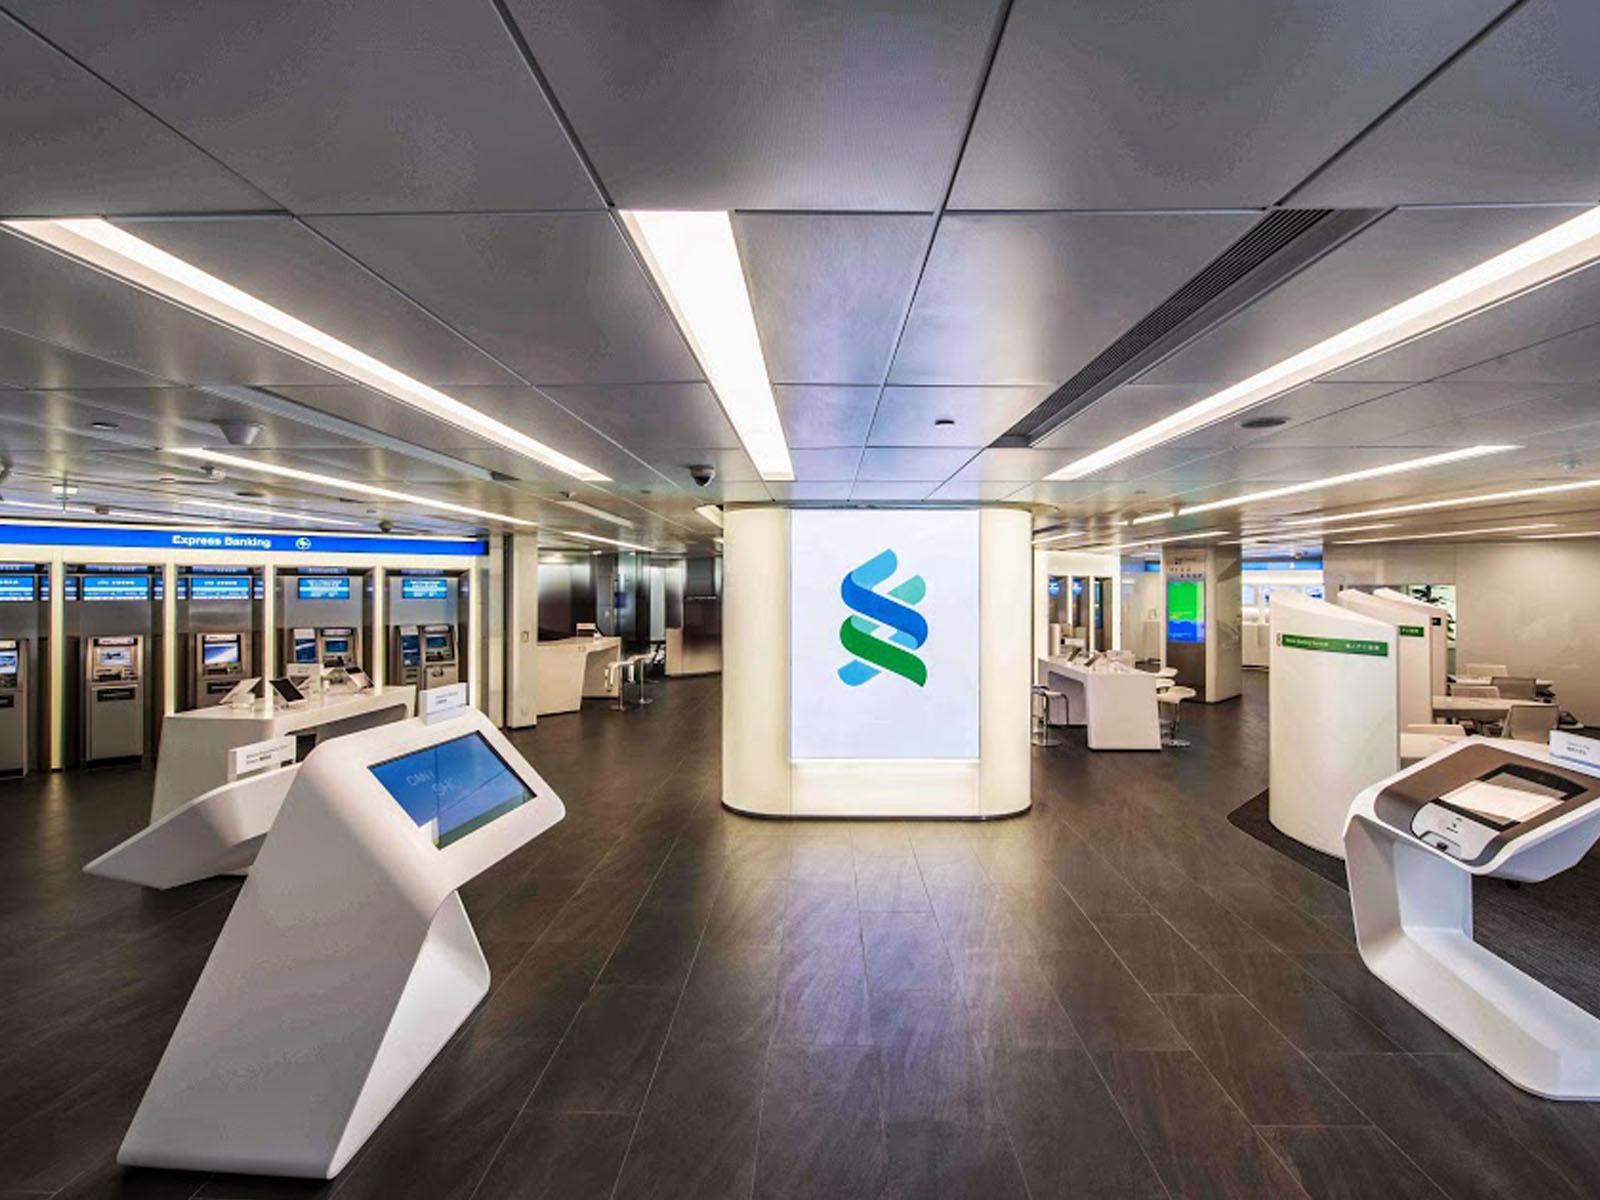 Standard Chartered announces PKR 12.1 Billion profit over 9 months